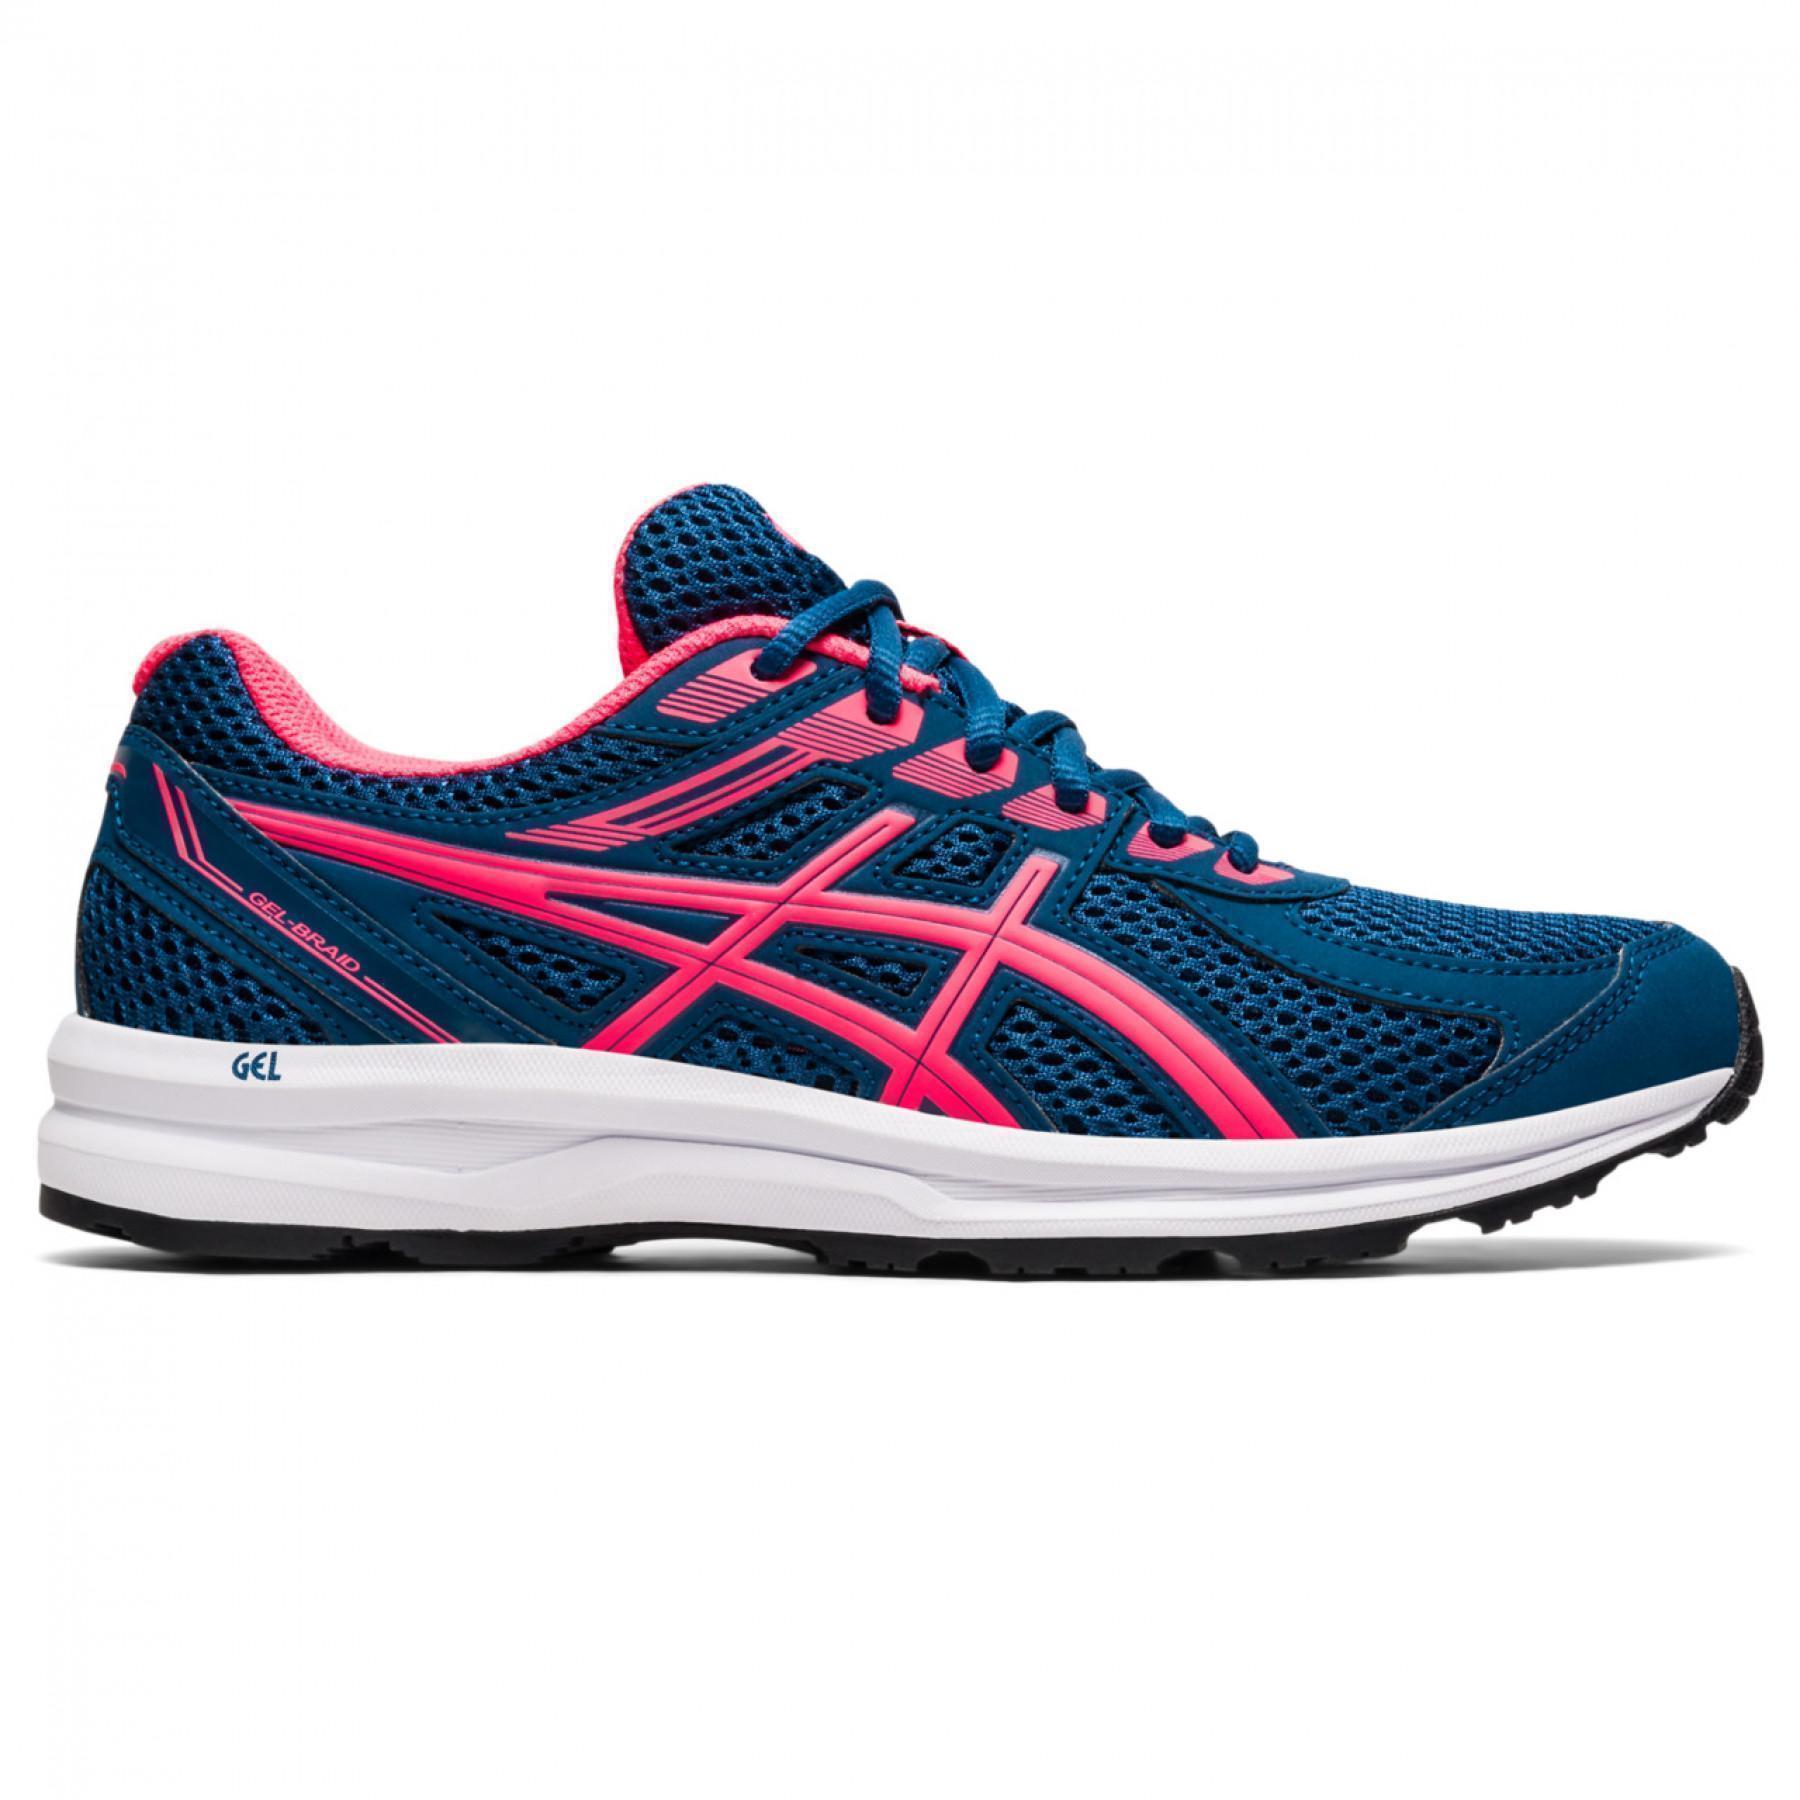 Women's shoes Asics Gel-Braid